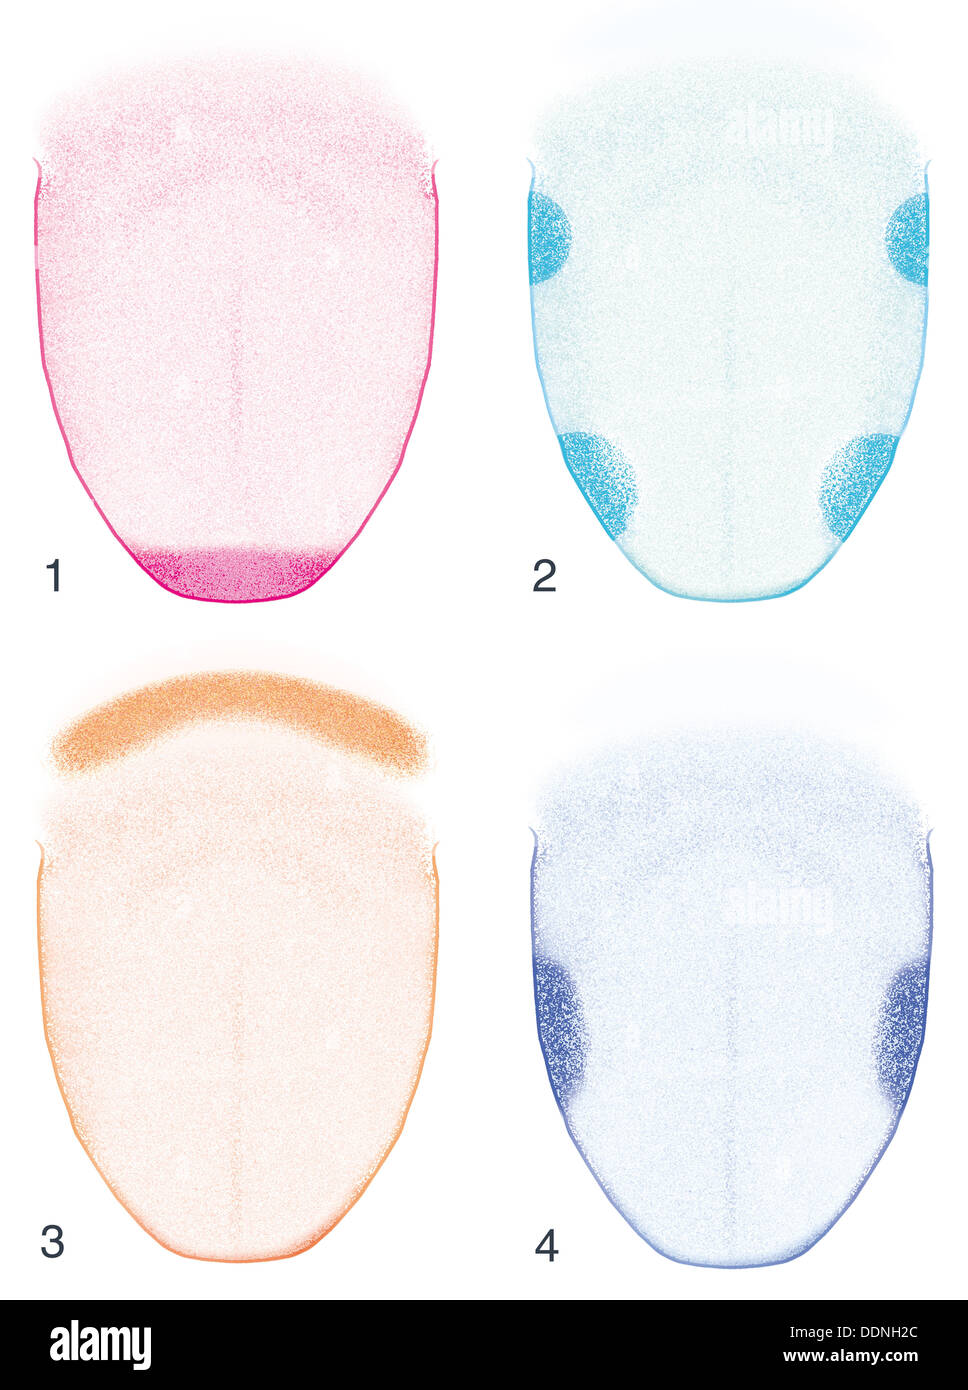 Flavor receptors of the tongue - Stock Image